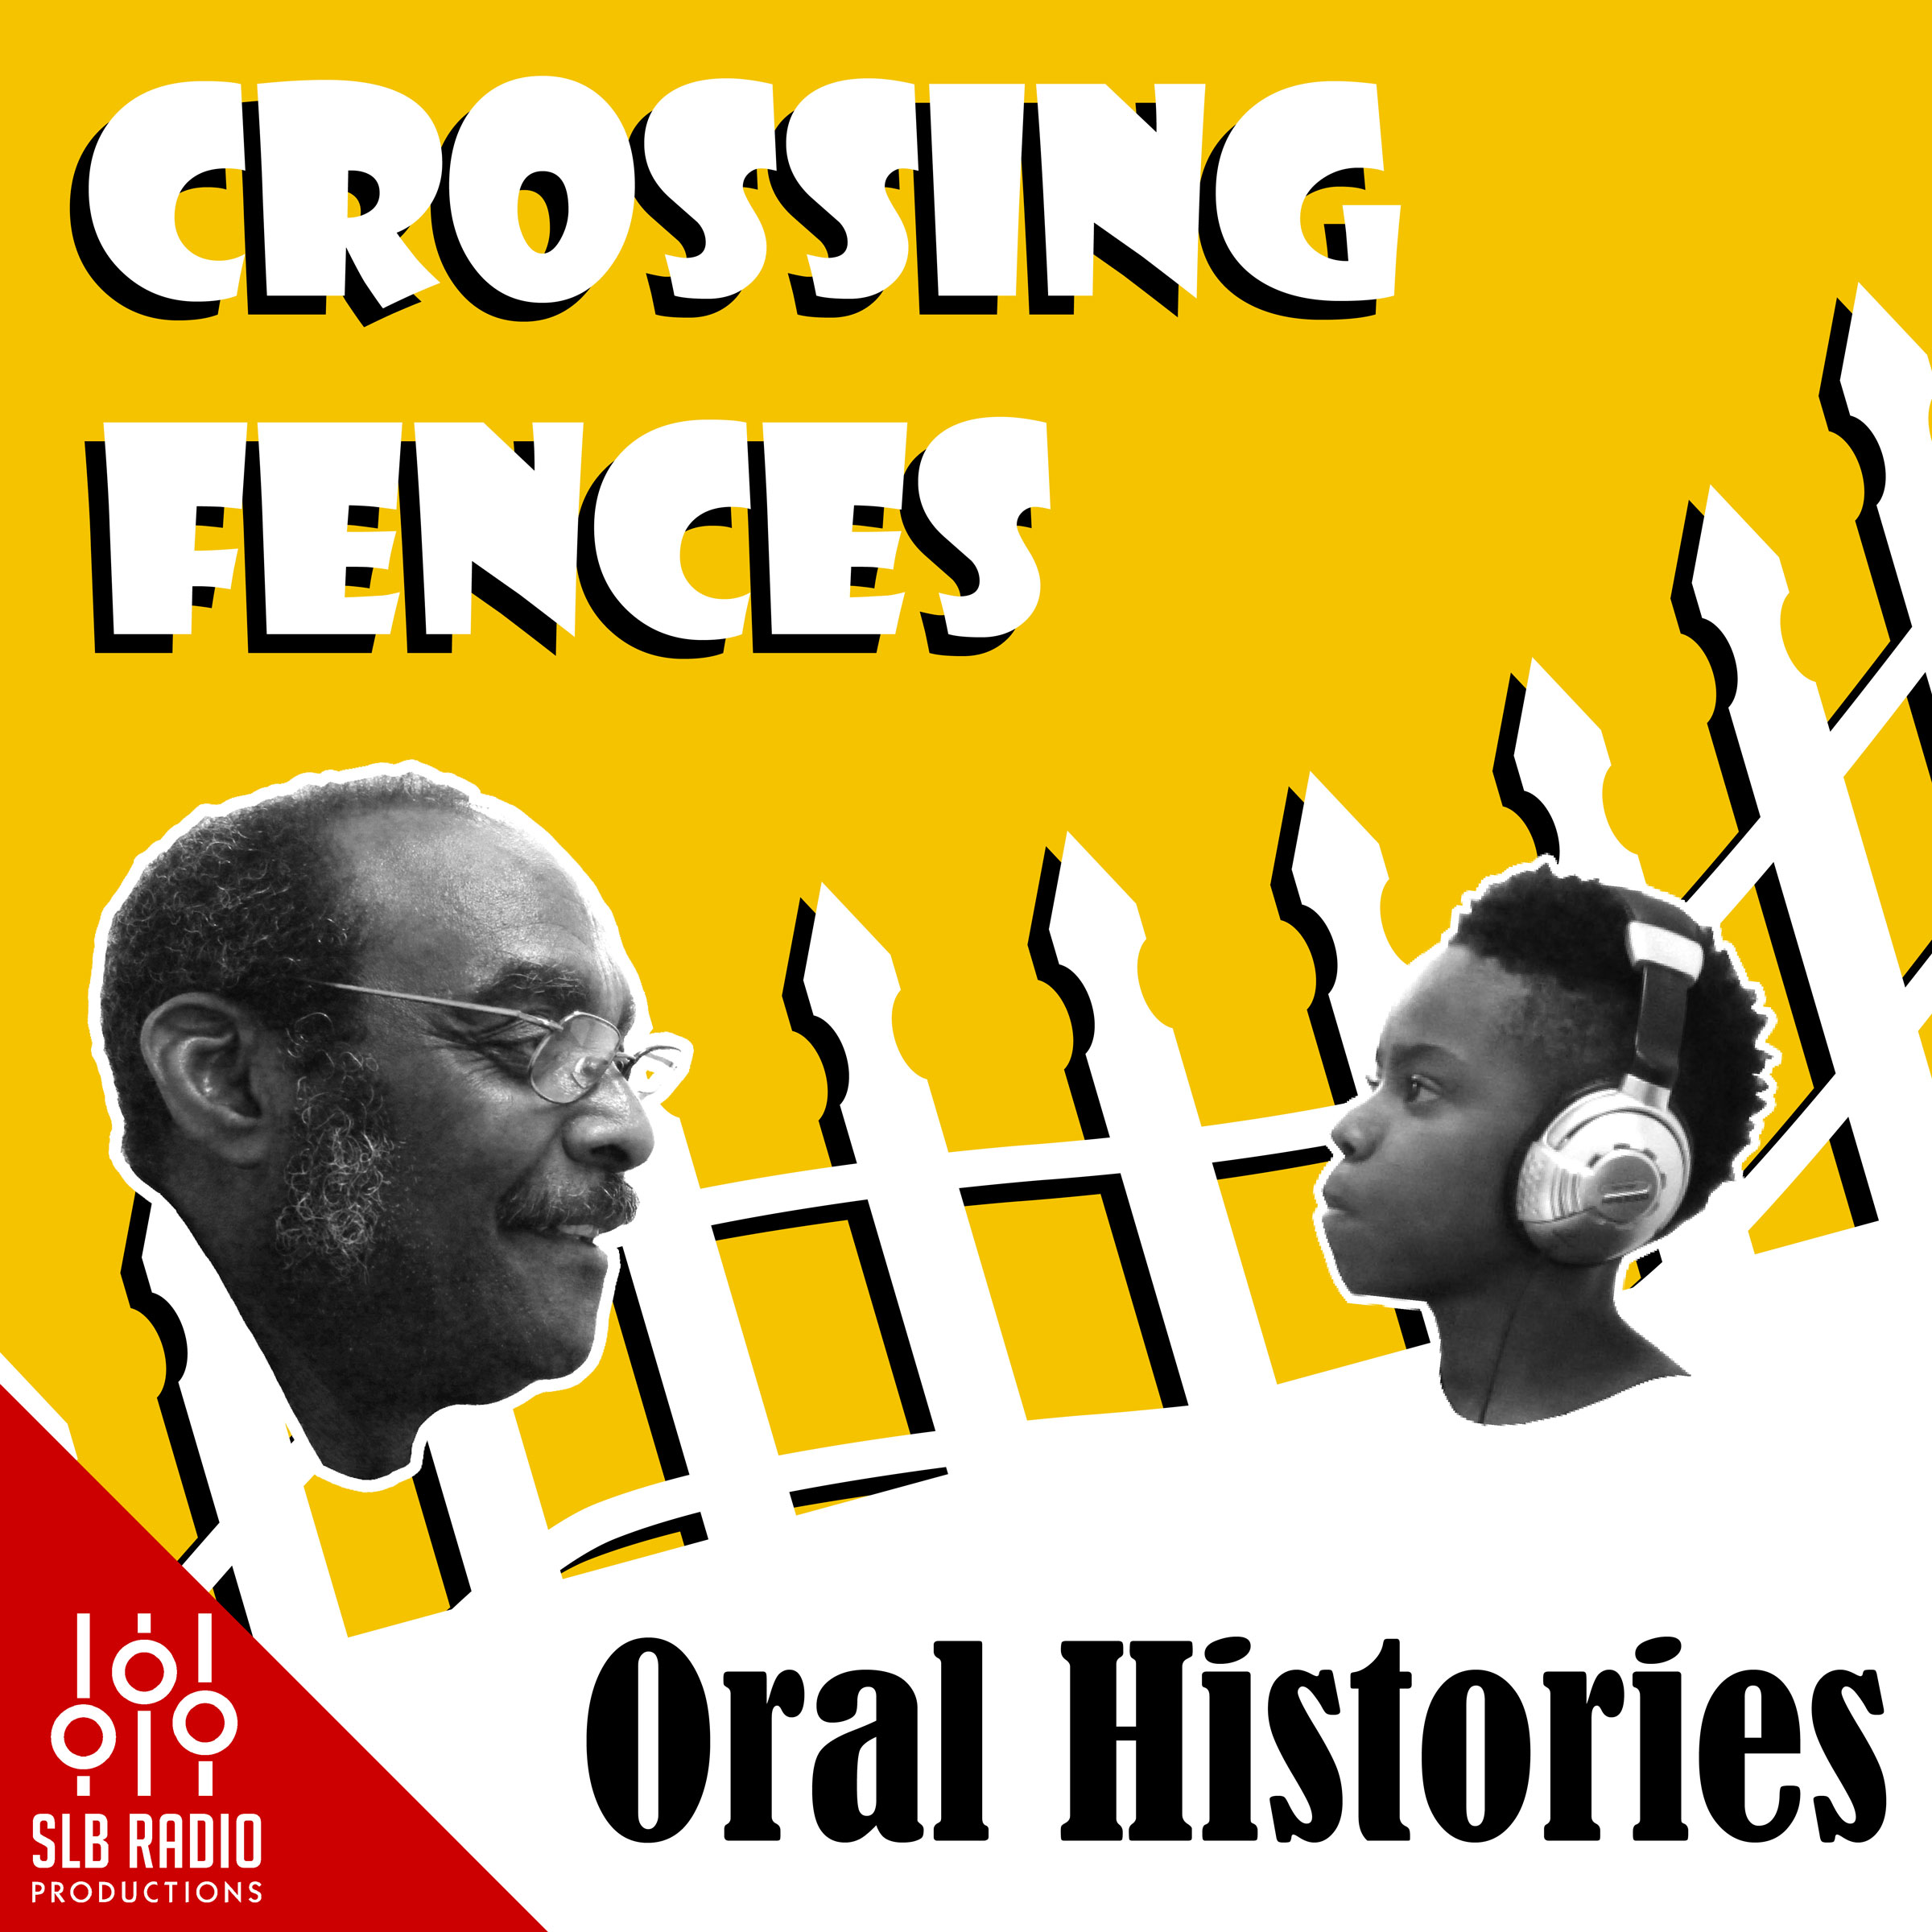 Crossing Fences show art